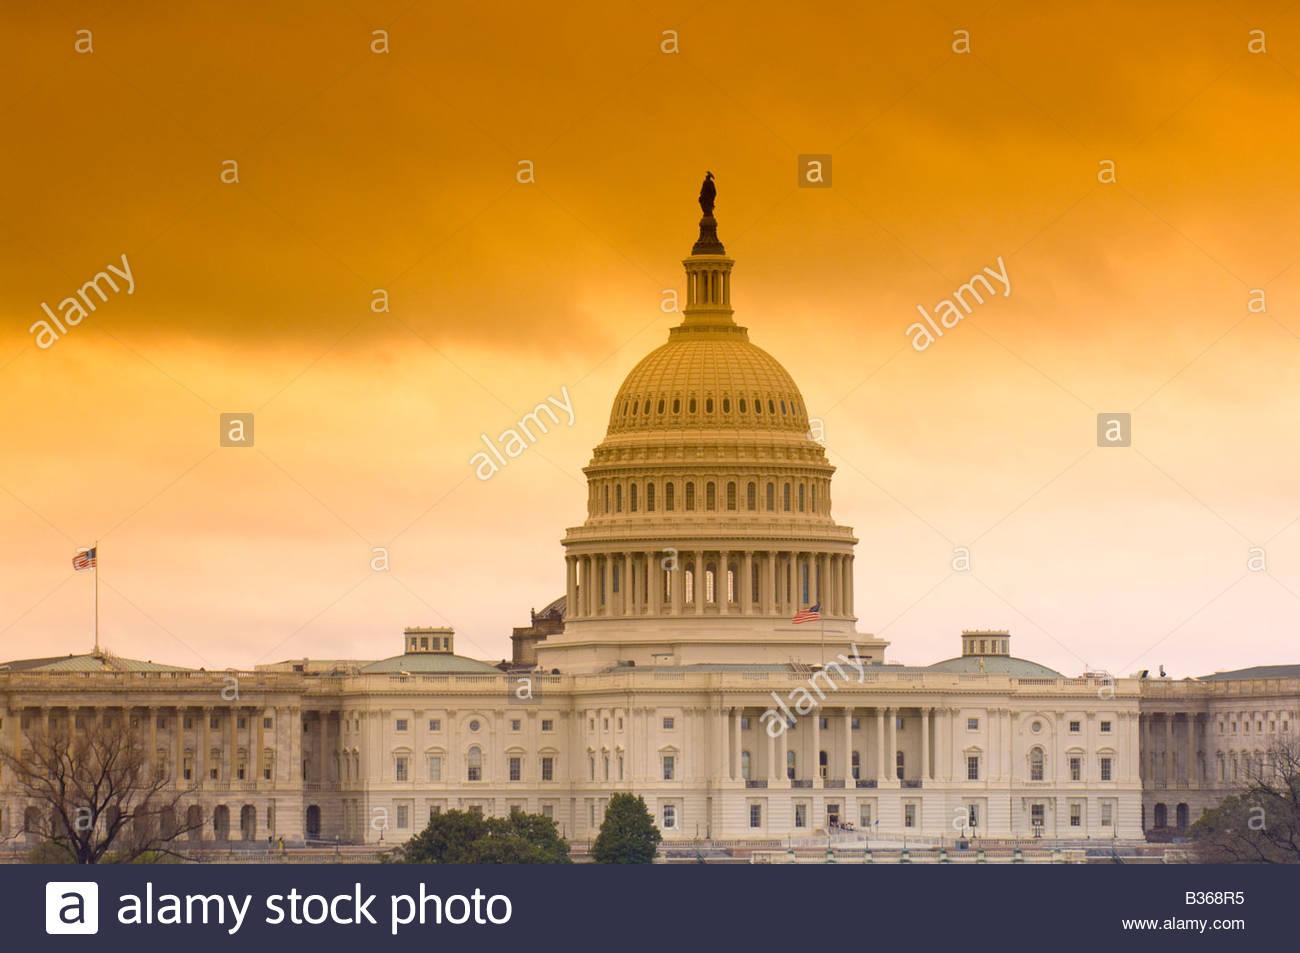 U S Capitol Washington D C U S A - Stock Image